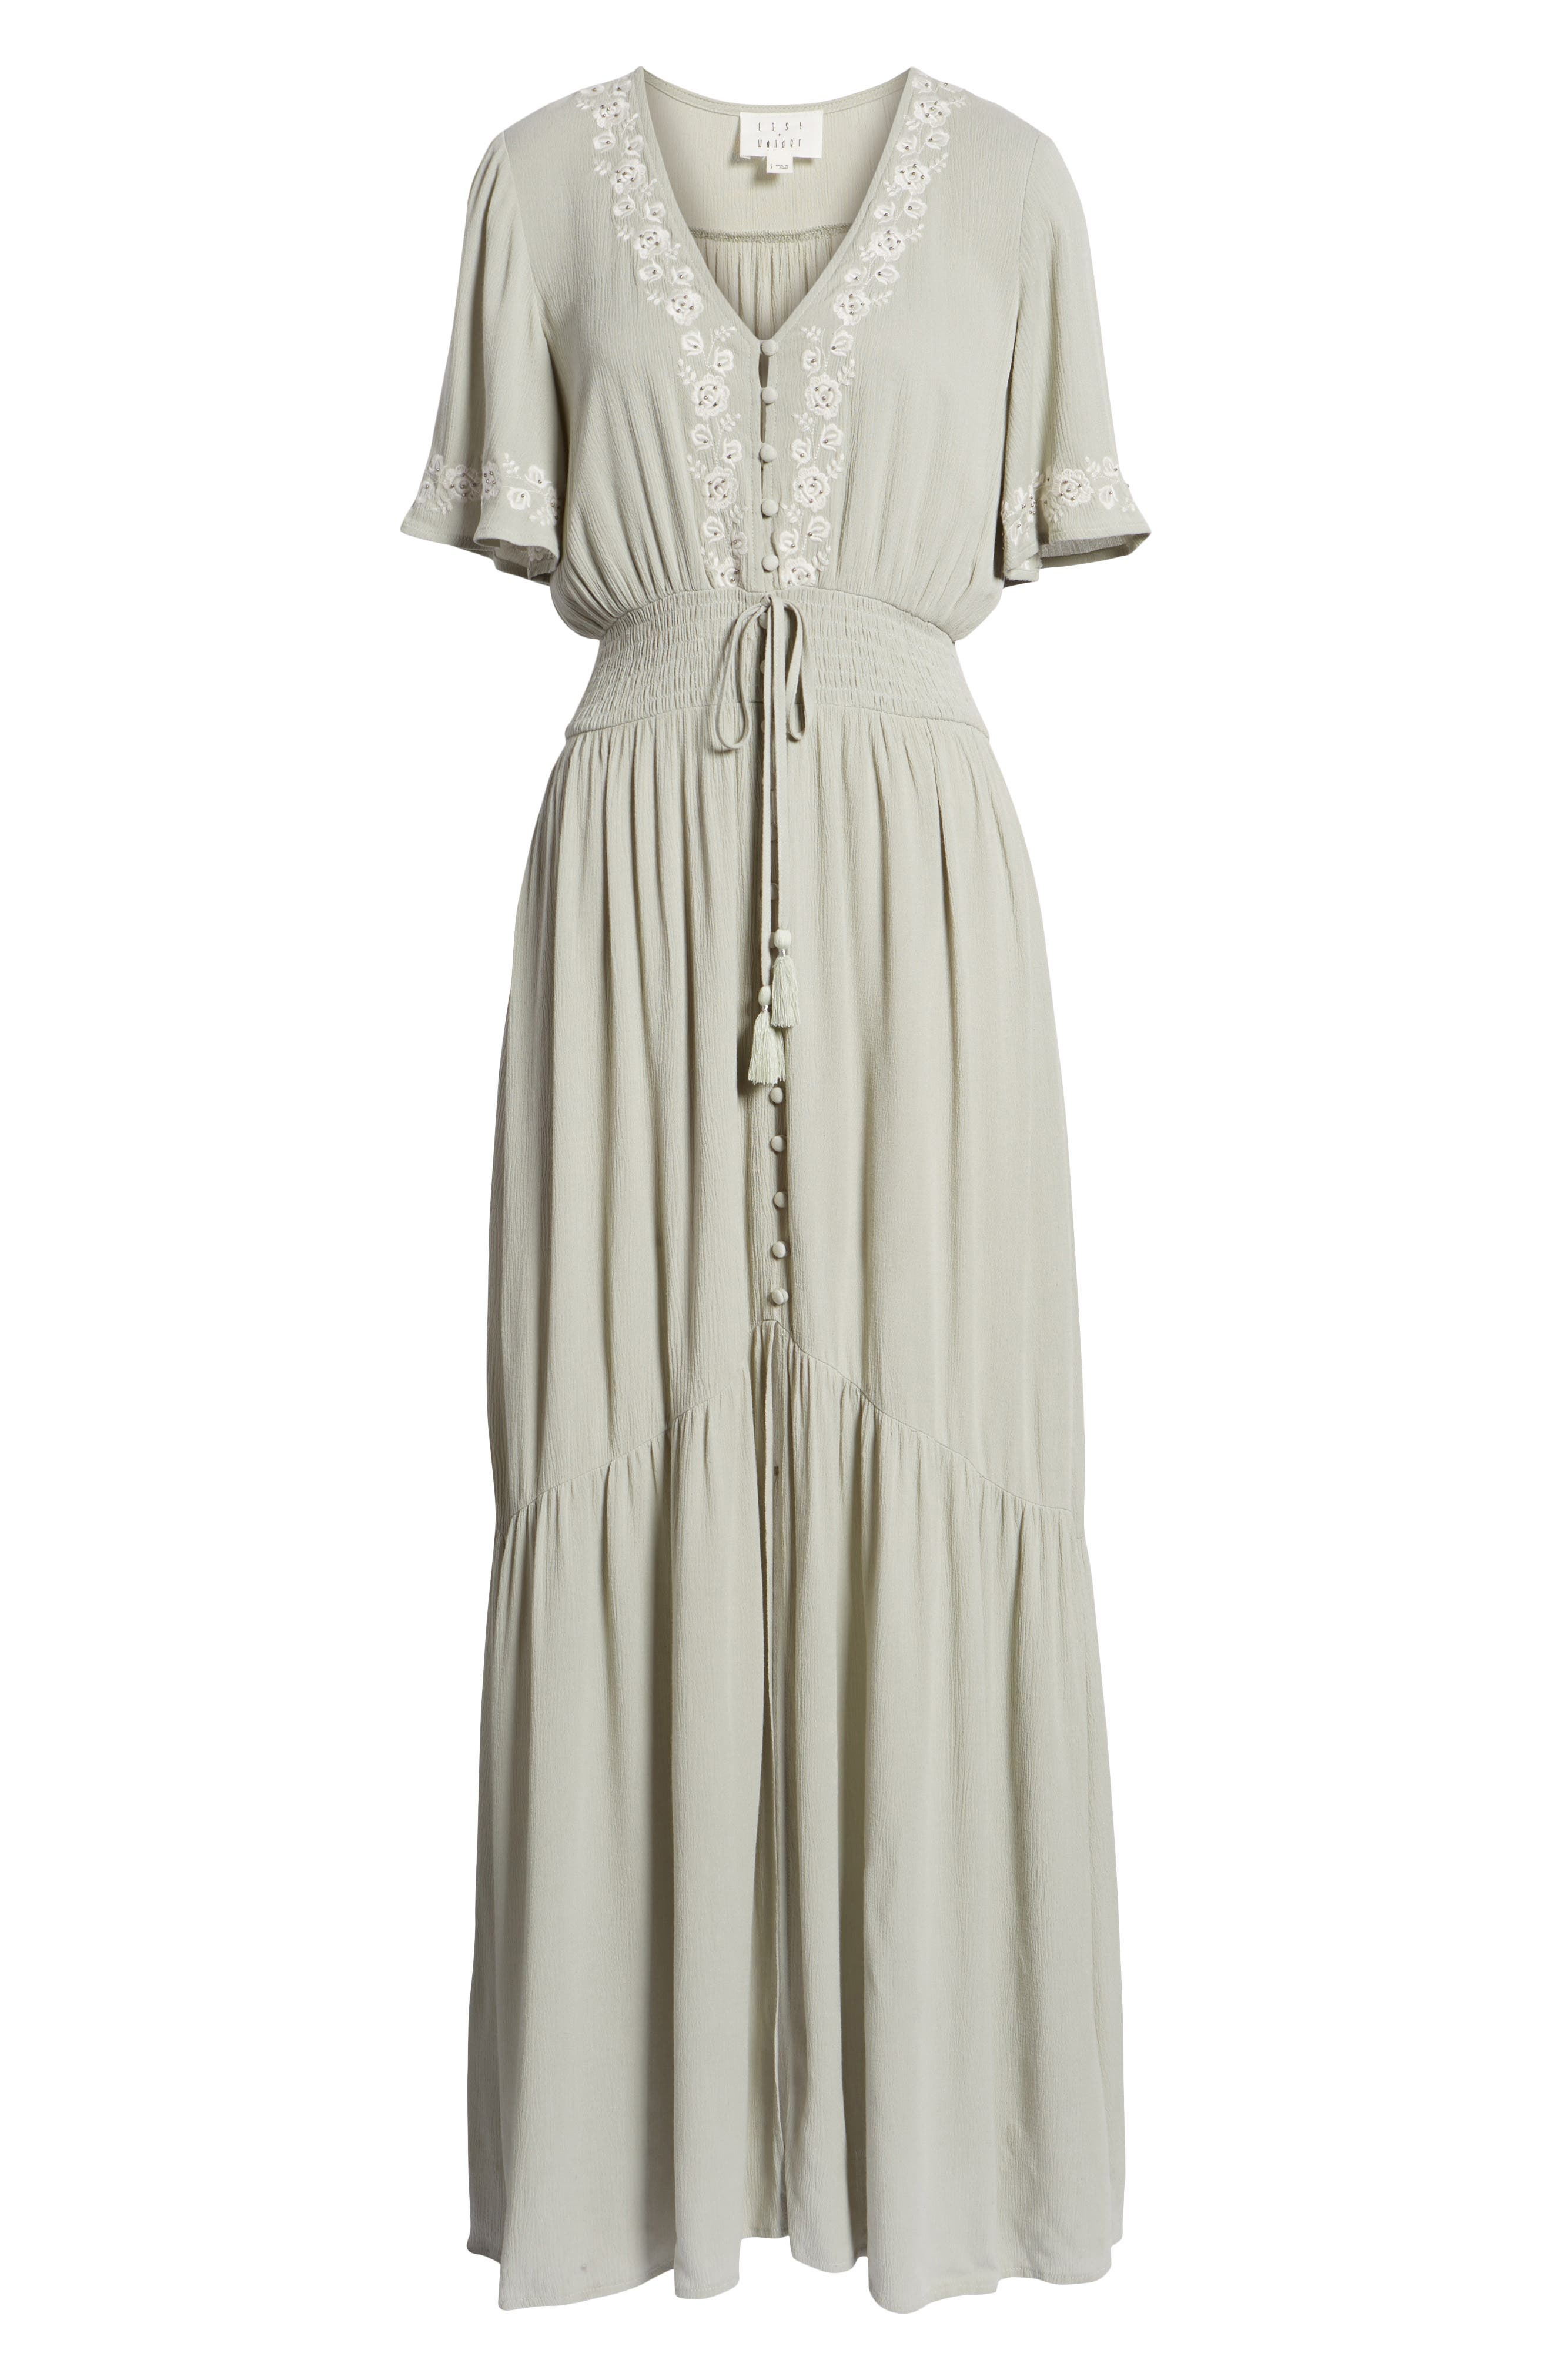 Athena Embroidered Maxi Dress,                             Alternate thumbnail 7, color,                             300